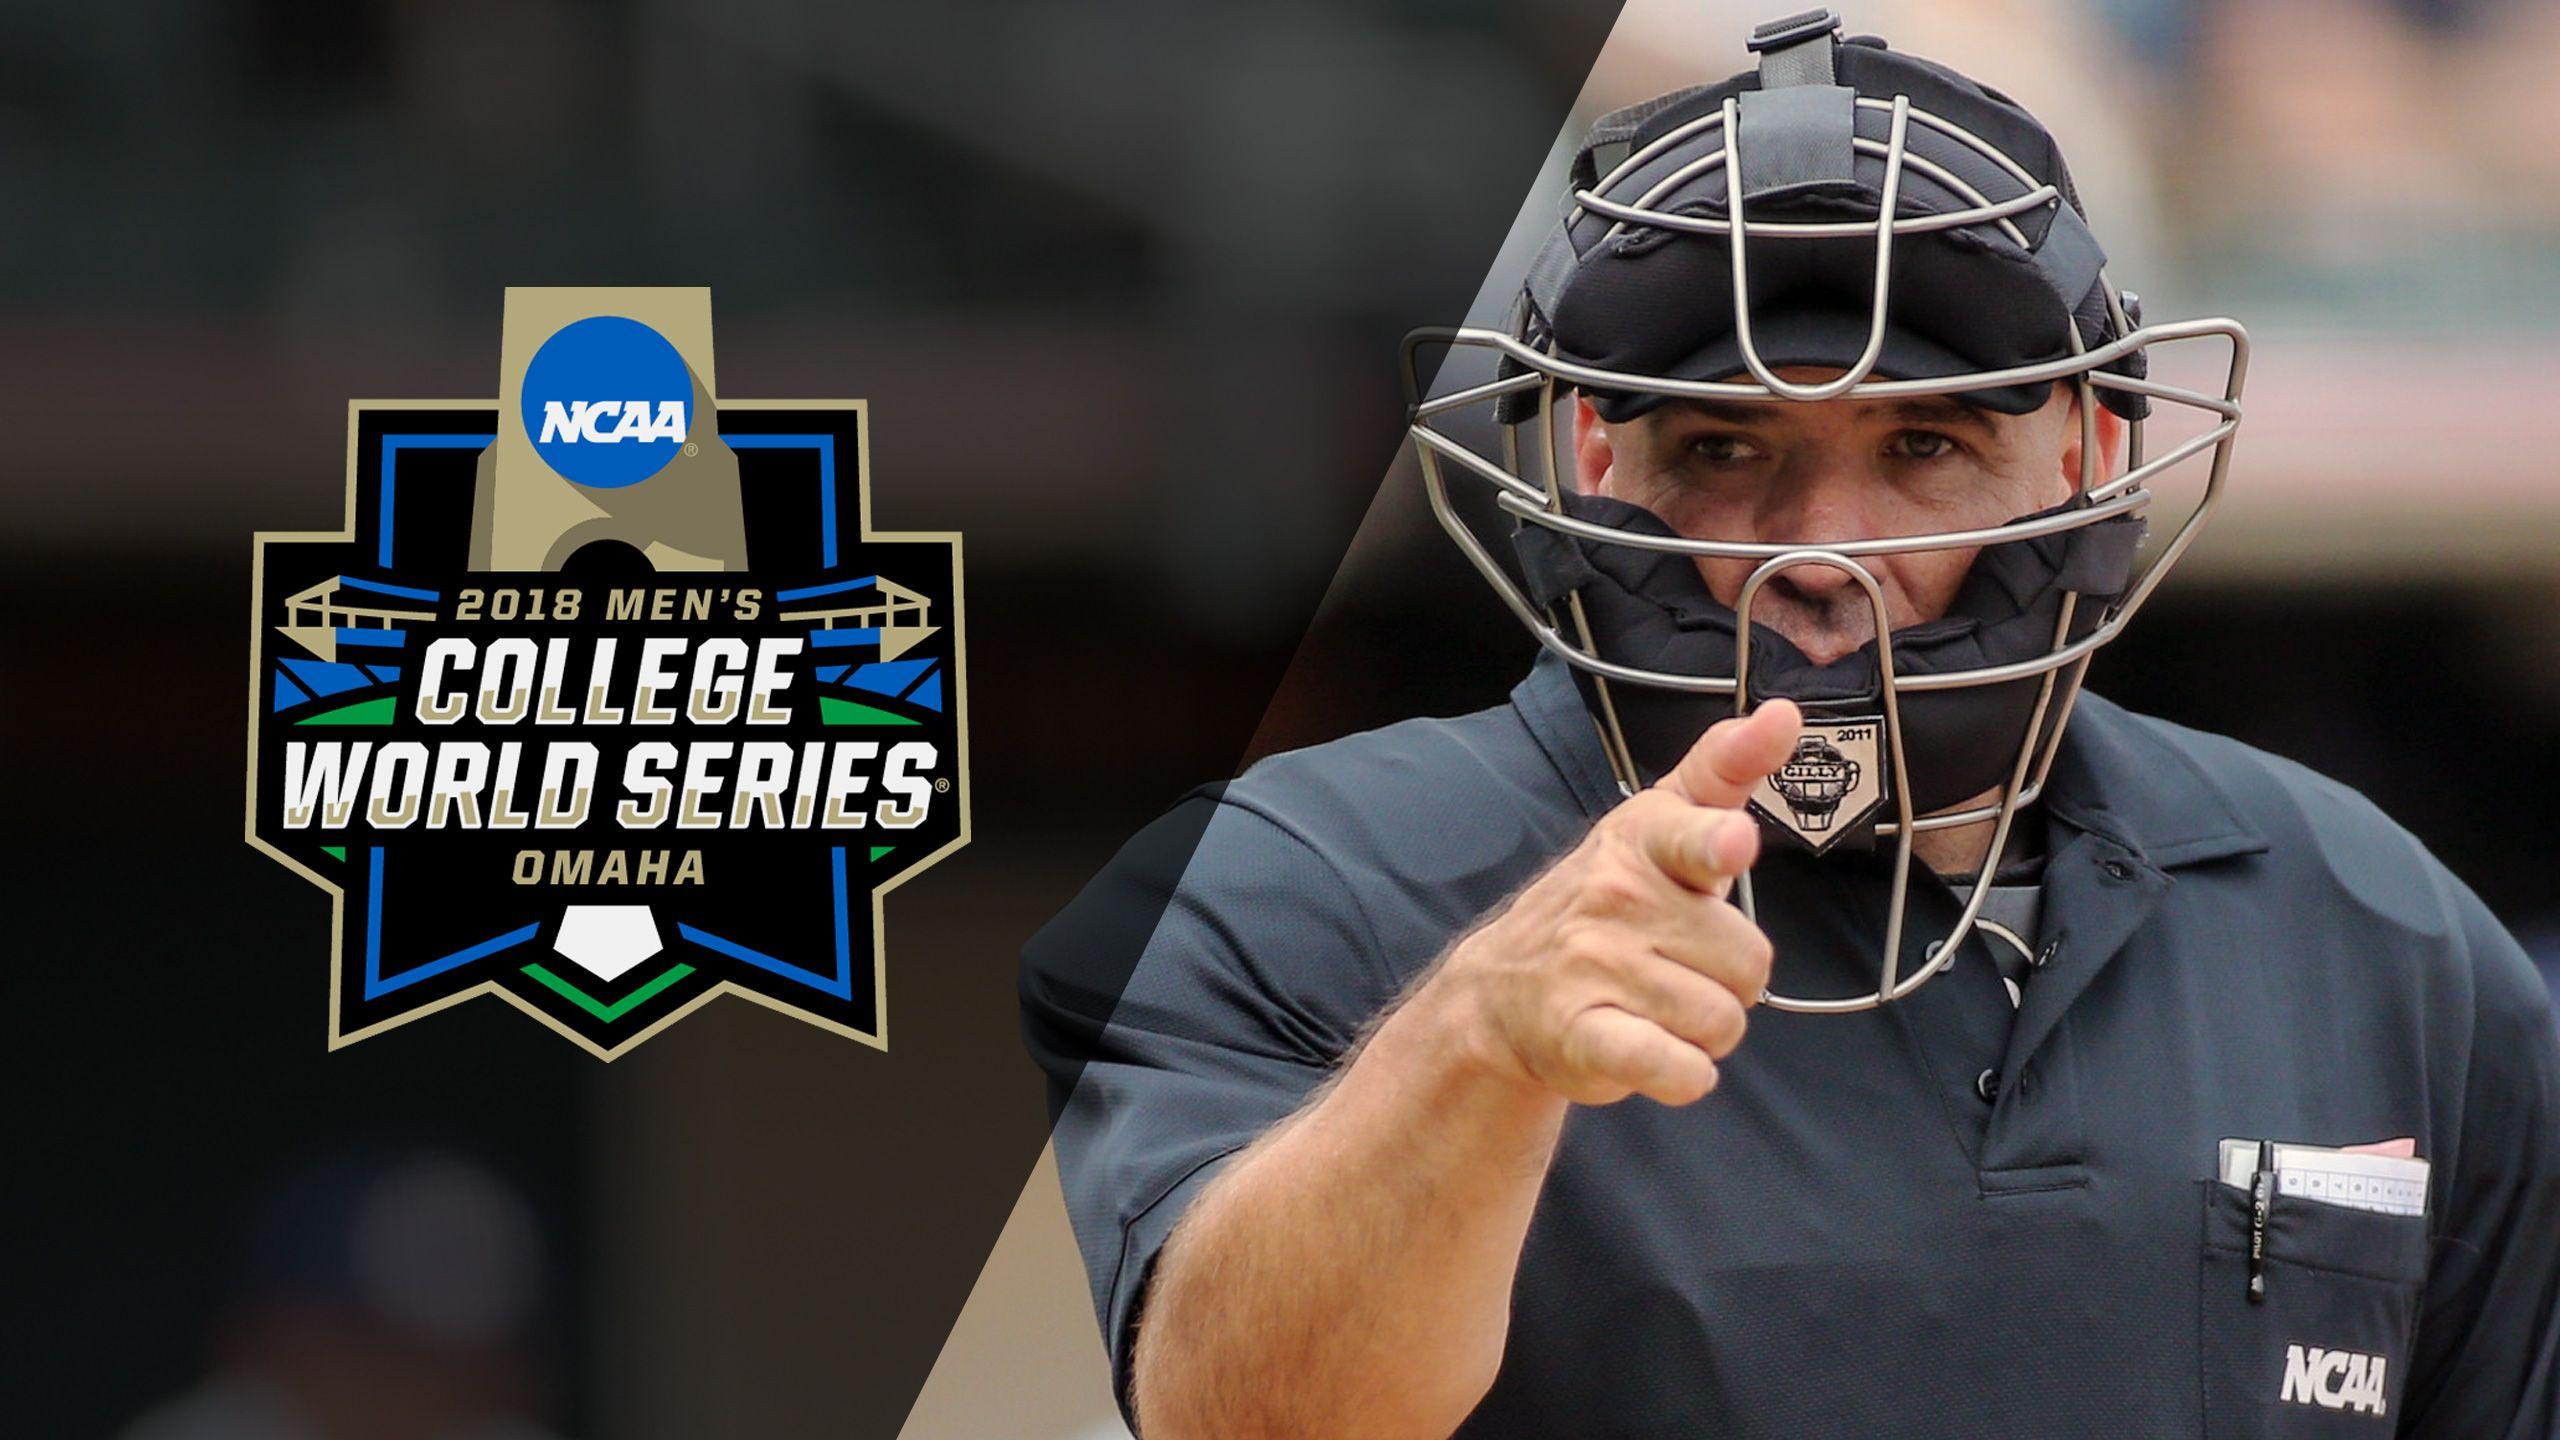 Ump Cam - #1 Florida vs. #13 Texas (Game 7) (College World Series)